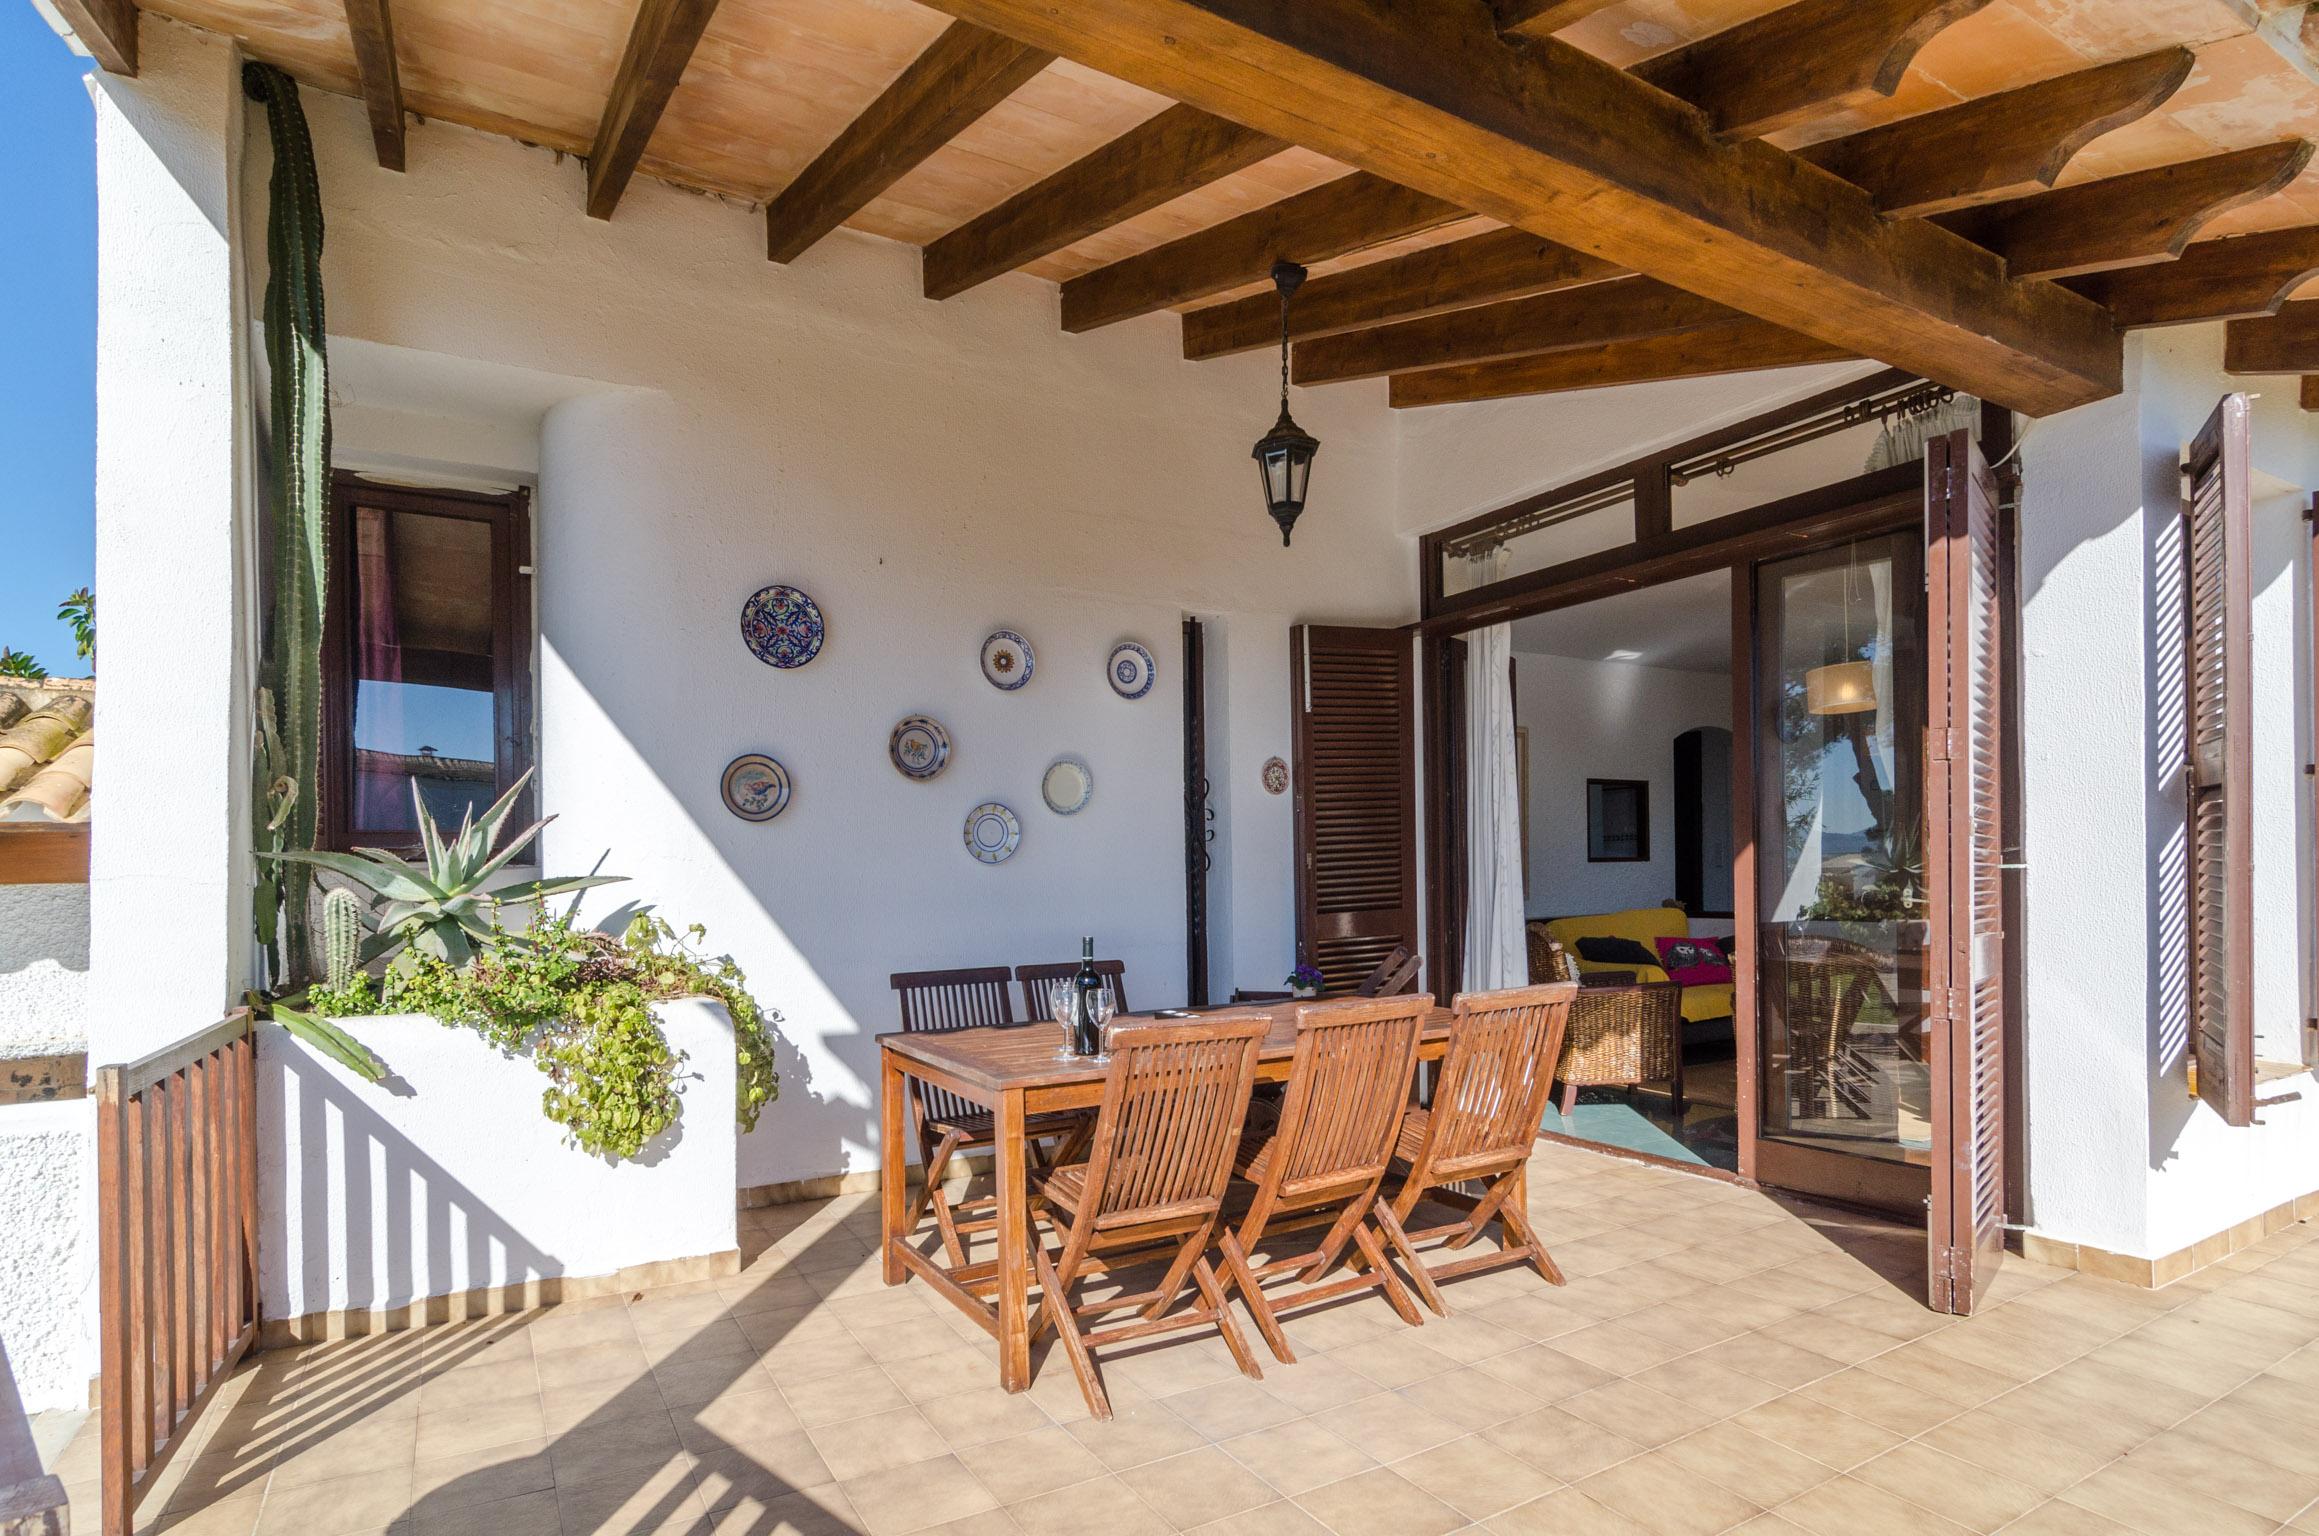 Ferienhaus CAN CALSINA (1871676), Cala Mandia, Mallorca, Balearische Inseln, Spanien, Bild 8